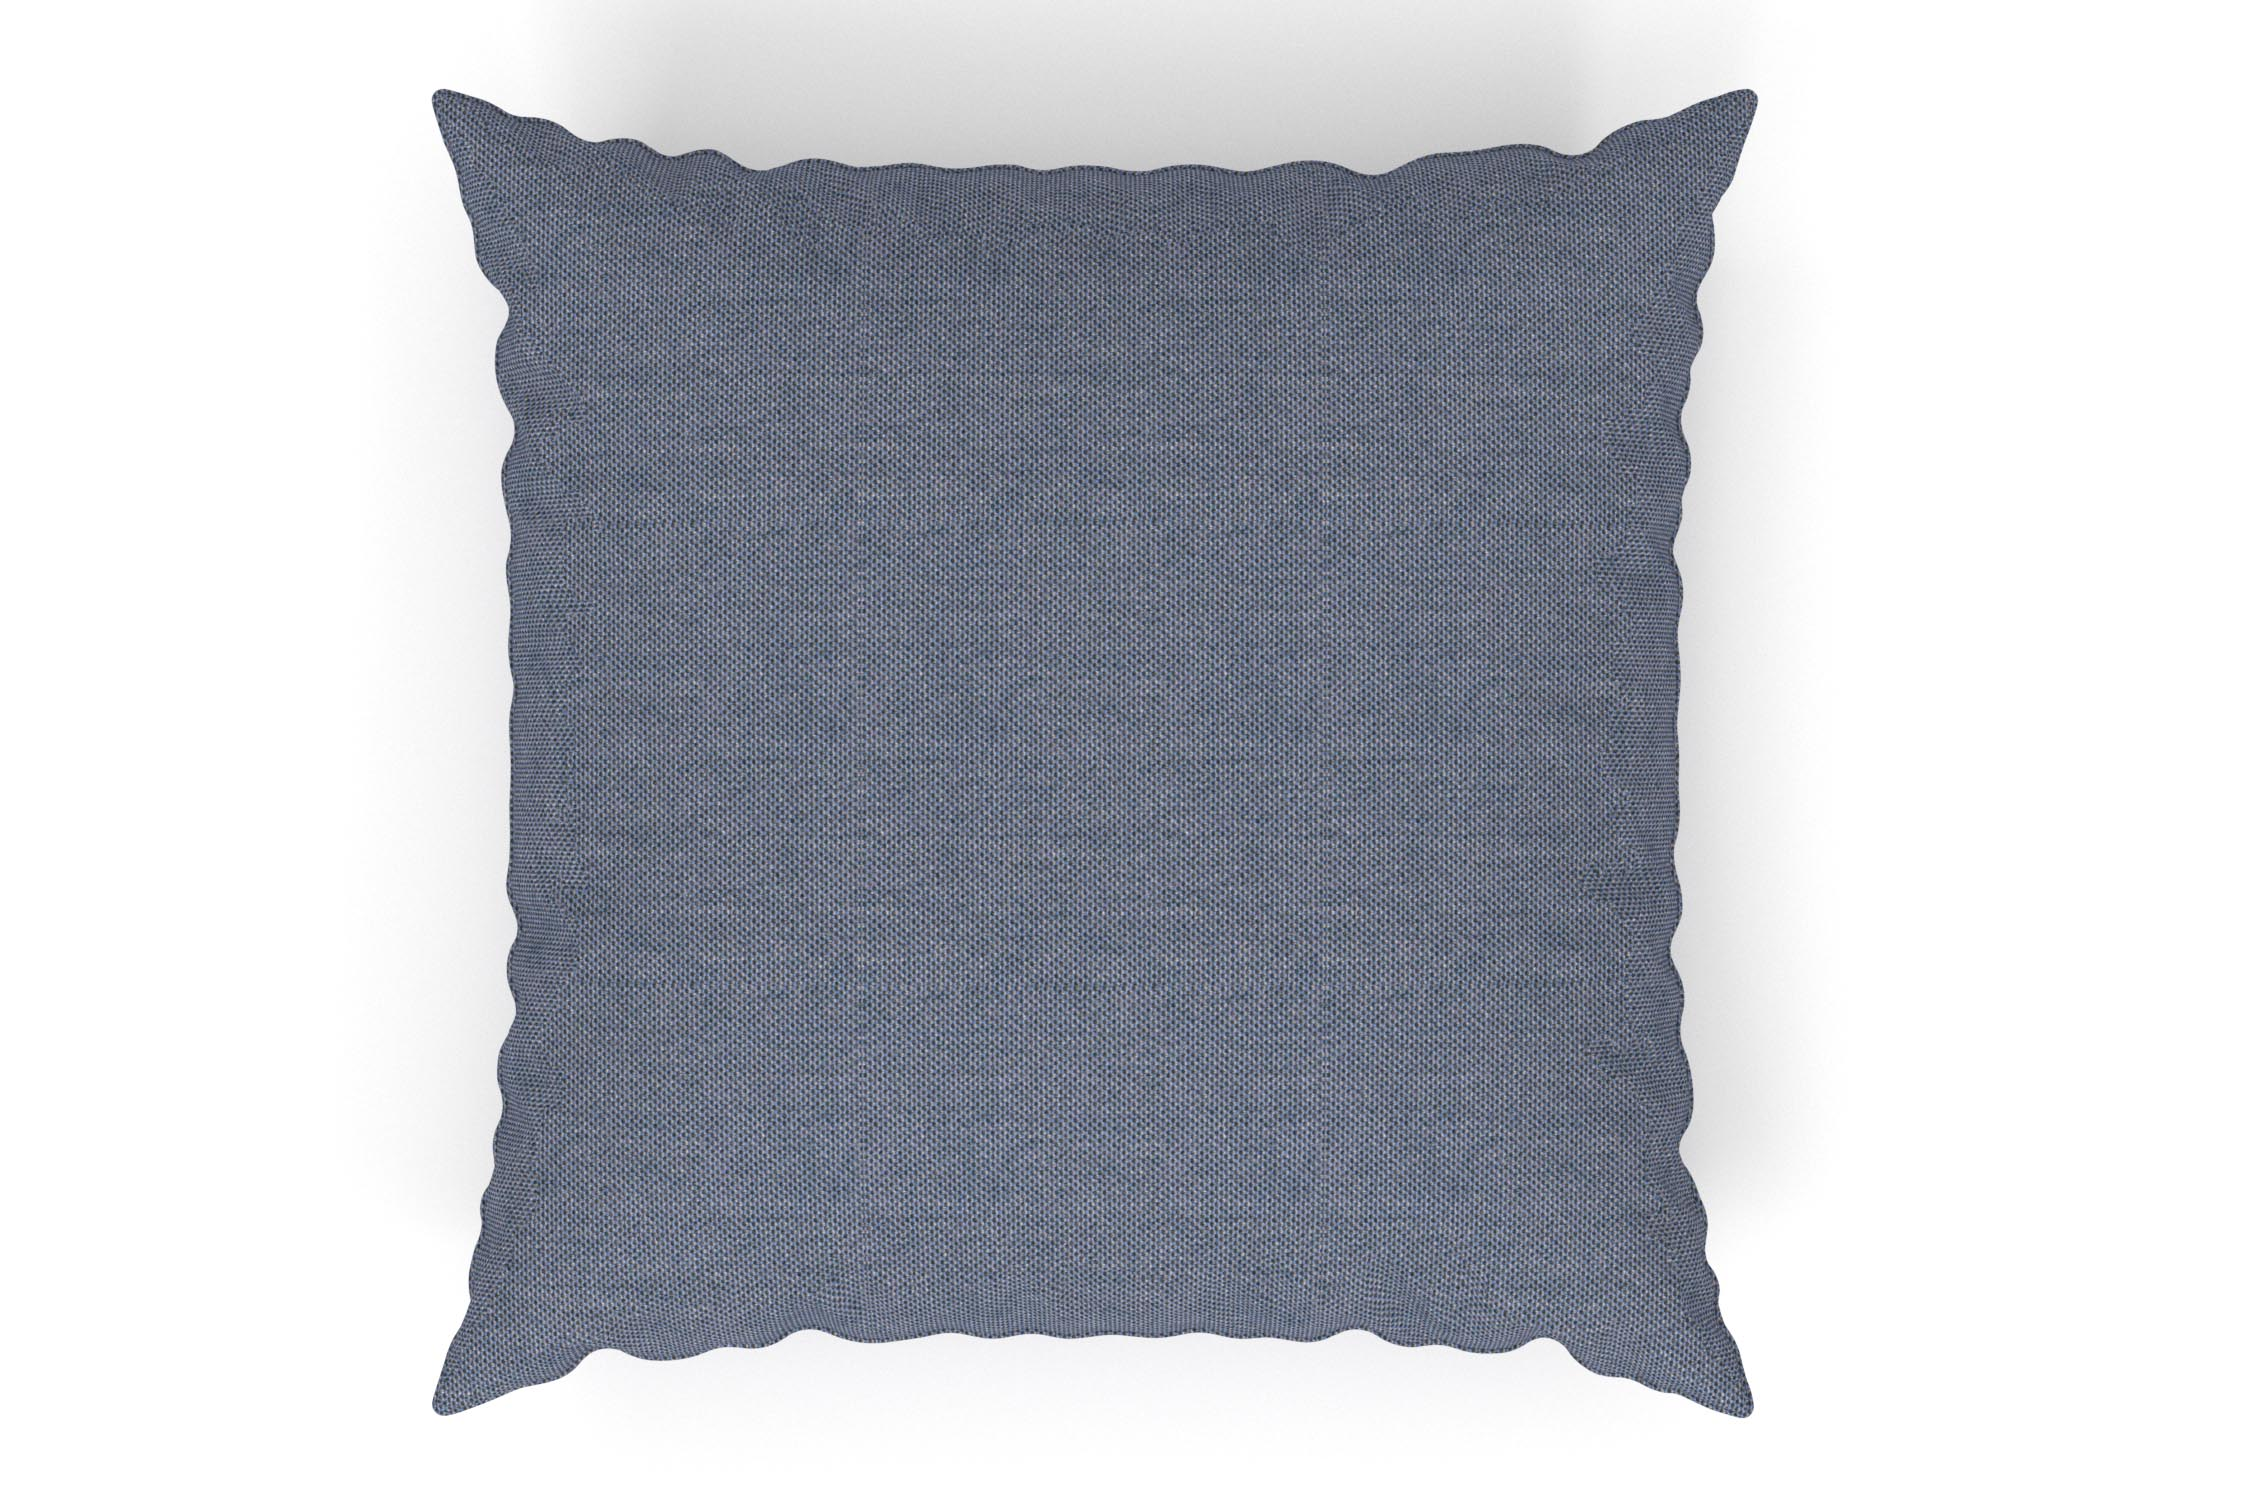 Подушка декоративнаяКвадратные подушки и наволочки<br><br><br>Material: Текстиль<br>Ширина см: 60.0<br>Глубина см: 60.0